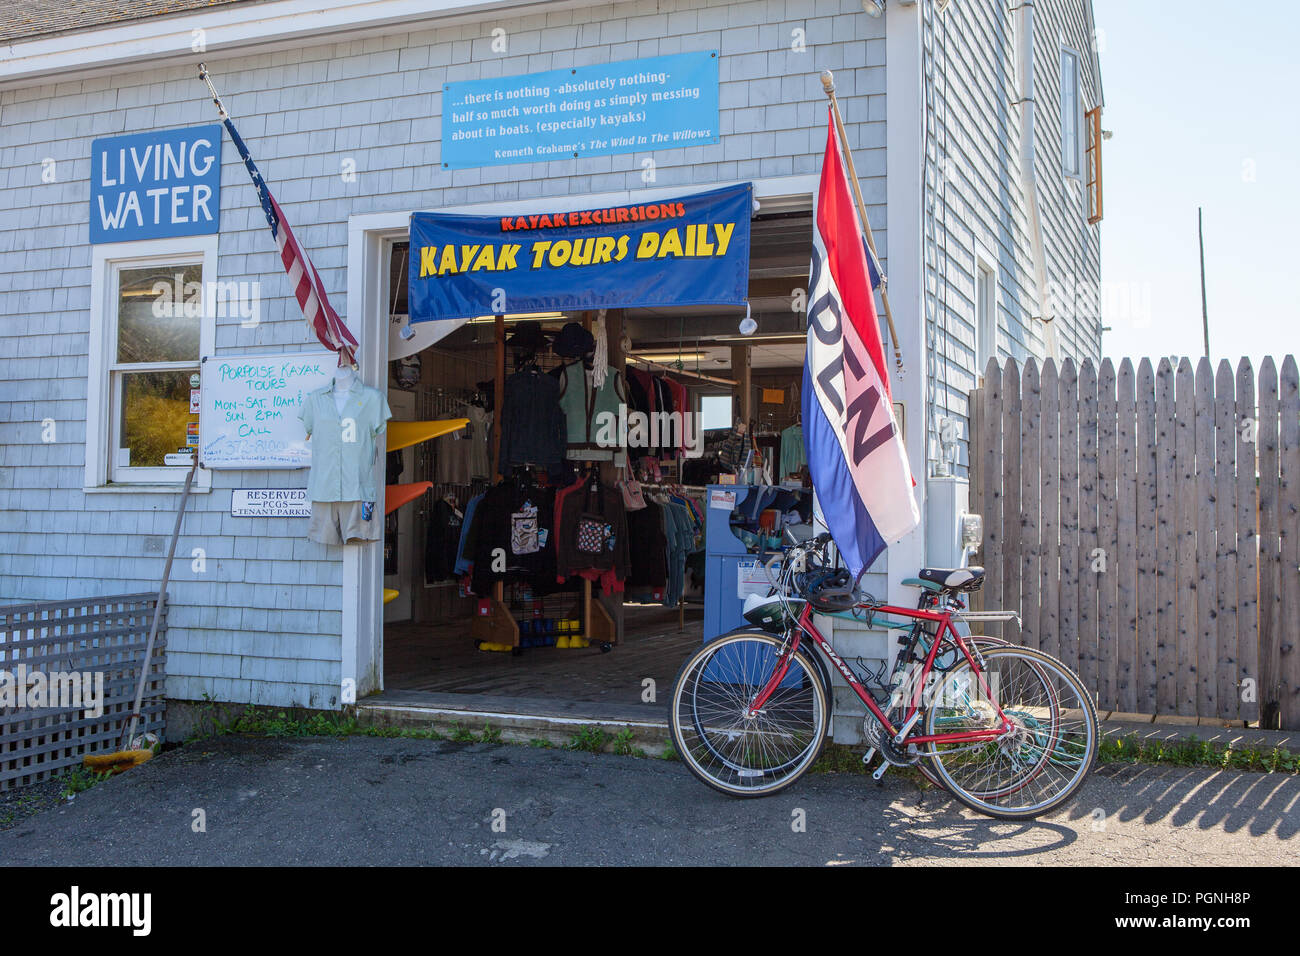 Bicycle Rental Stock Photos & Bicycle Rental Stock Images